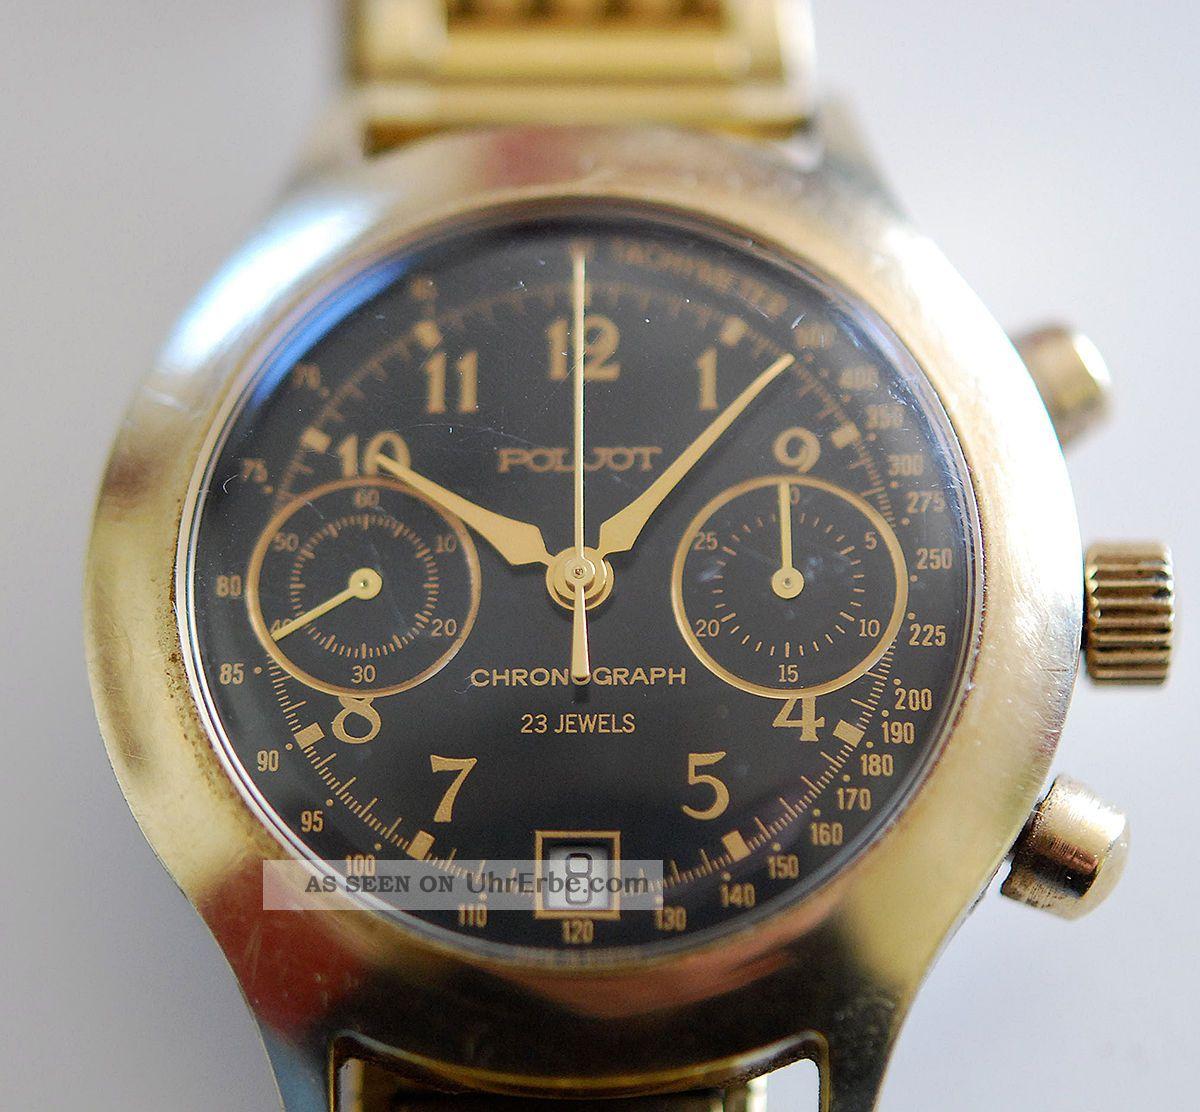 Poljot,  Chronograph - 23 Jewels,  Herrenuhr,  Sammlerstück,  Udssr / Cccp Armbanduhren Bild